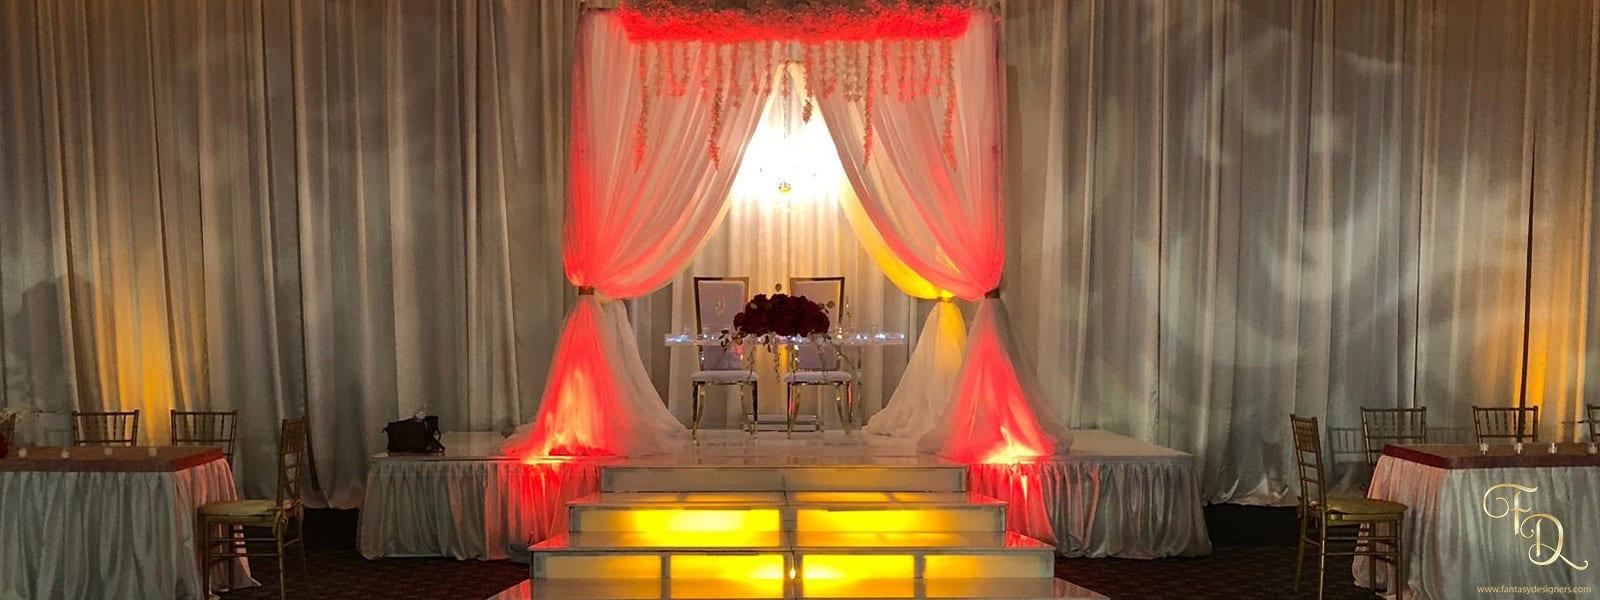 H&m-wedding-feature